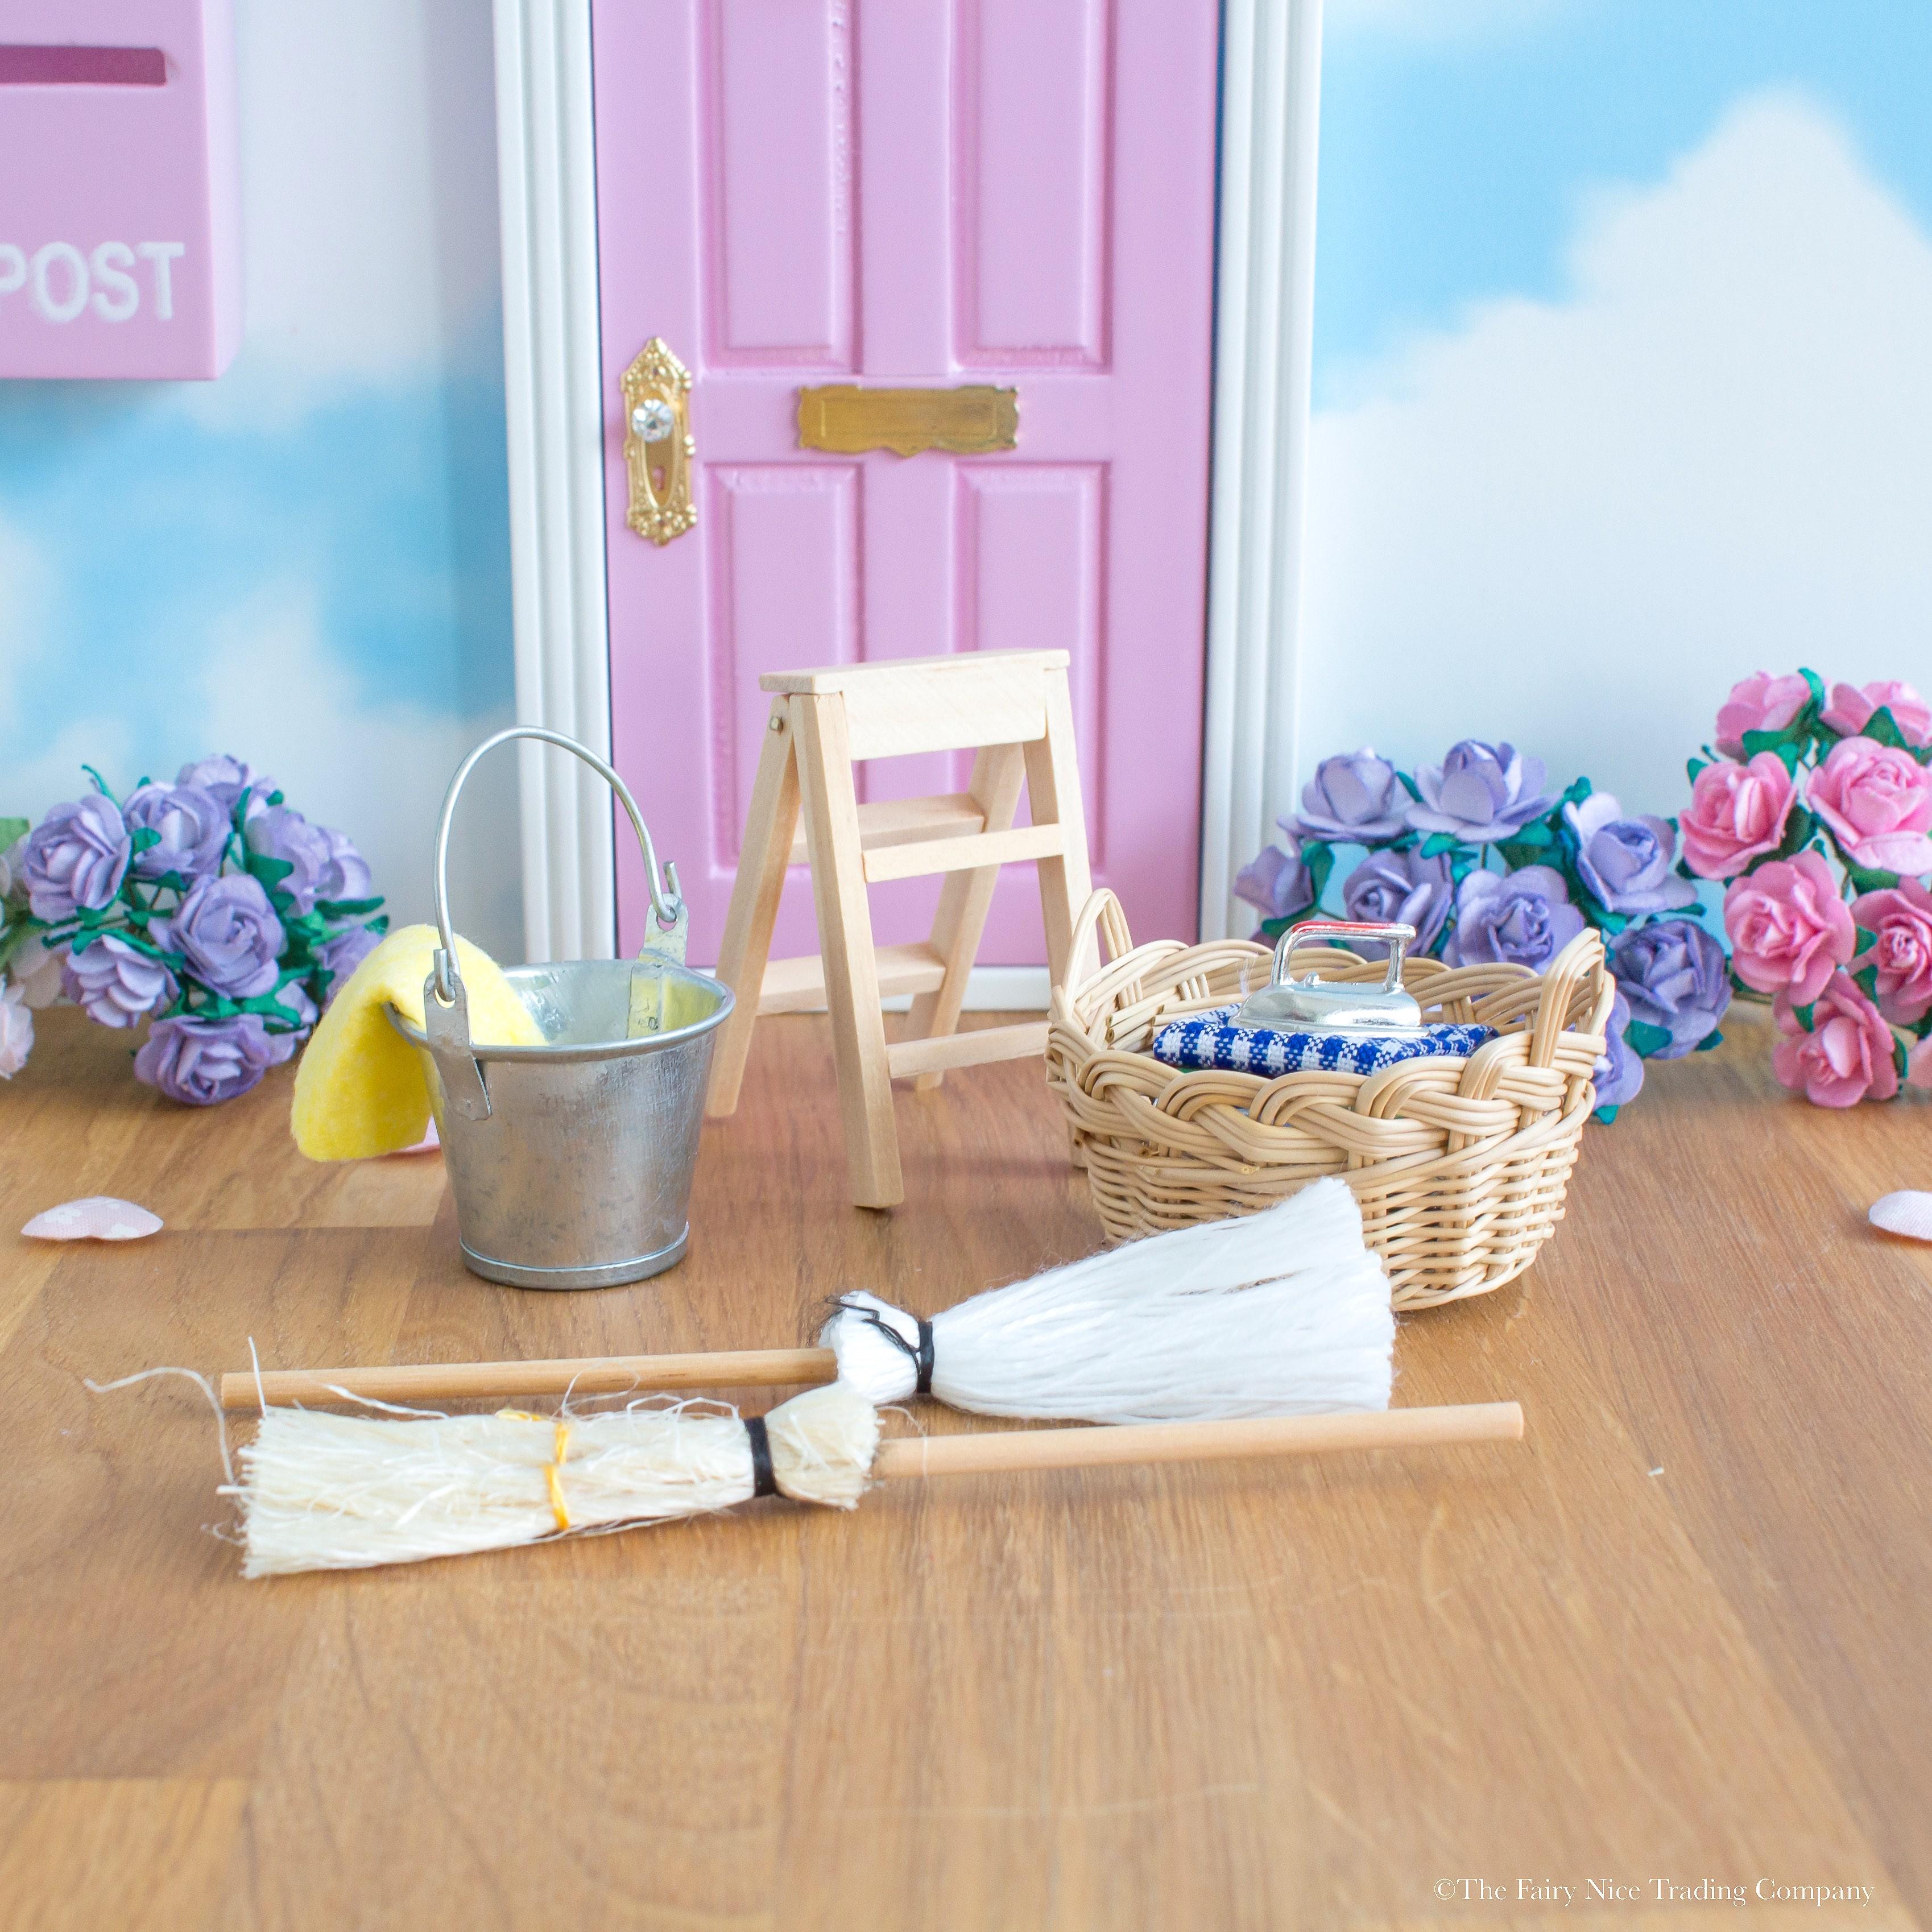 Cleaning Fairy Fairy Door accessory set